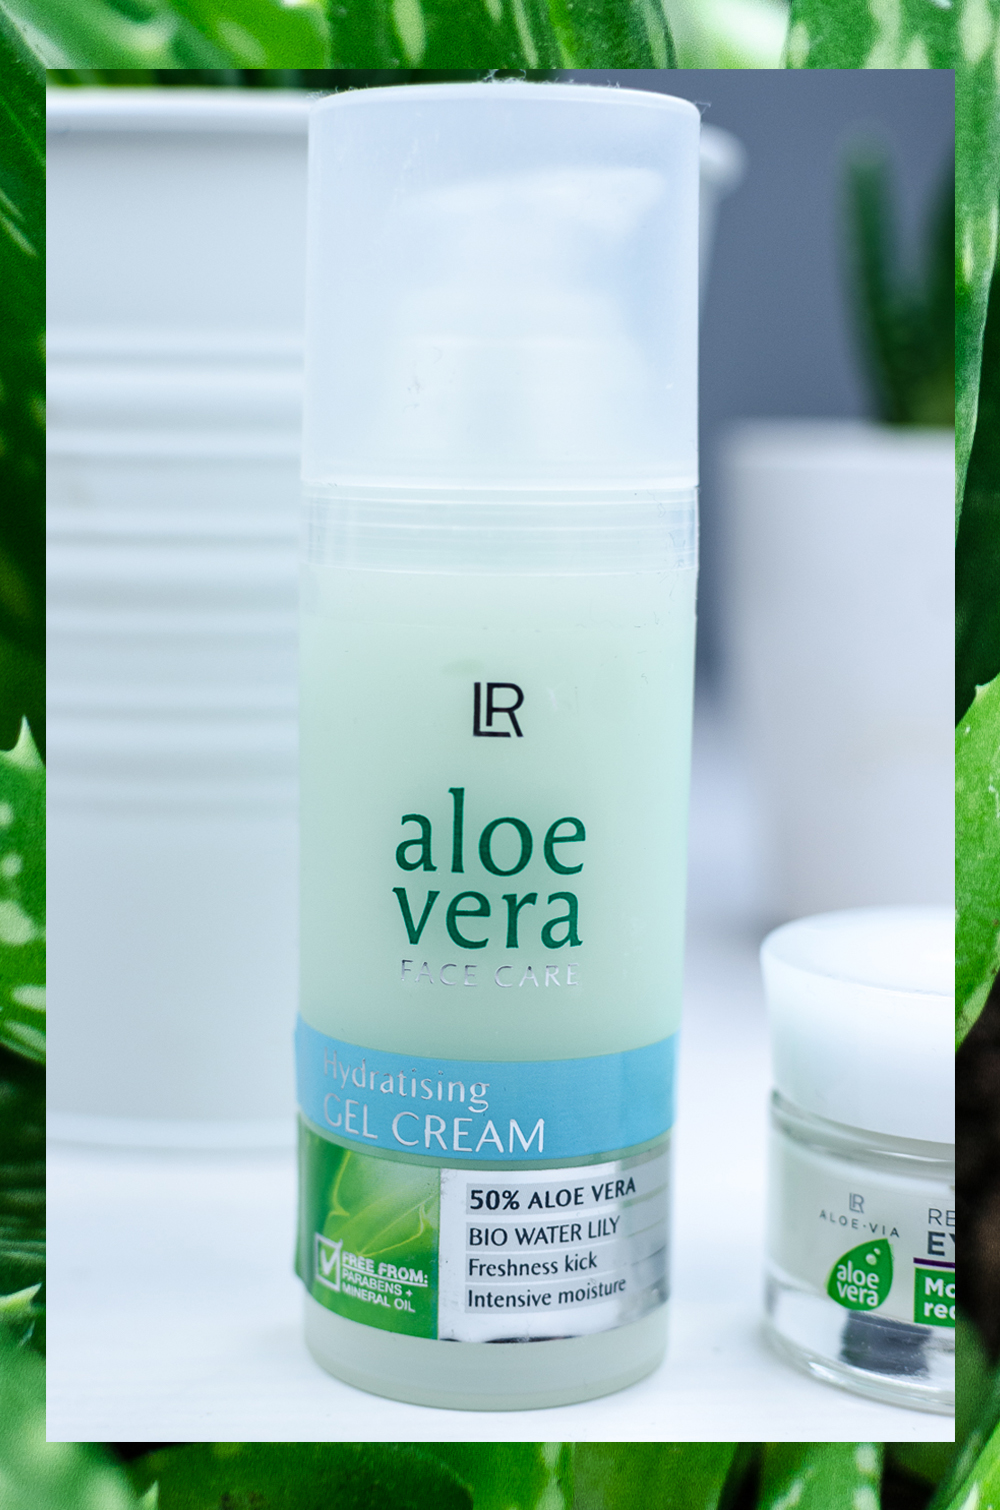 andysparkles-5 Gründe für Aloe Vera, Aloe Vera Pflege, LR Health Beauty